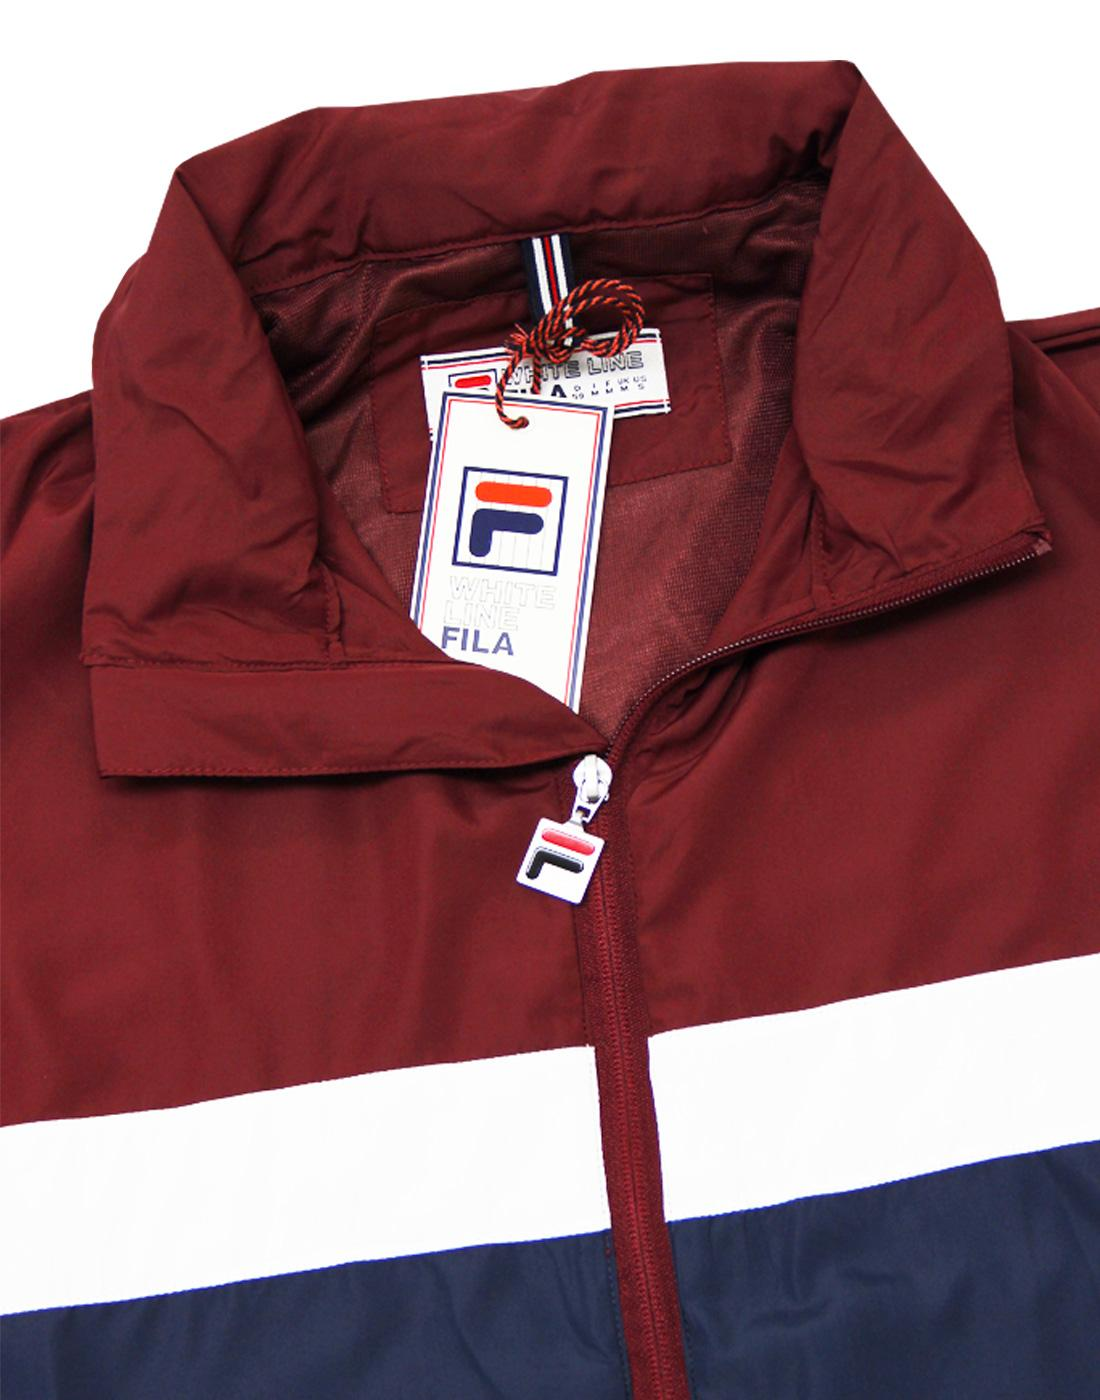 bc64167ca47 FILA VINTAGE Cipolla 2 Retro 80s Casuals Pack Away Panel Jacket